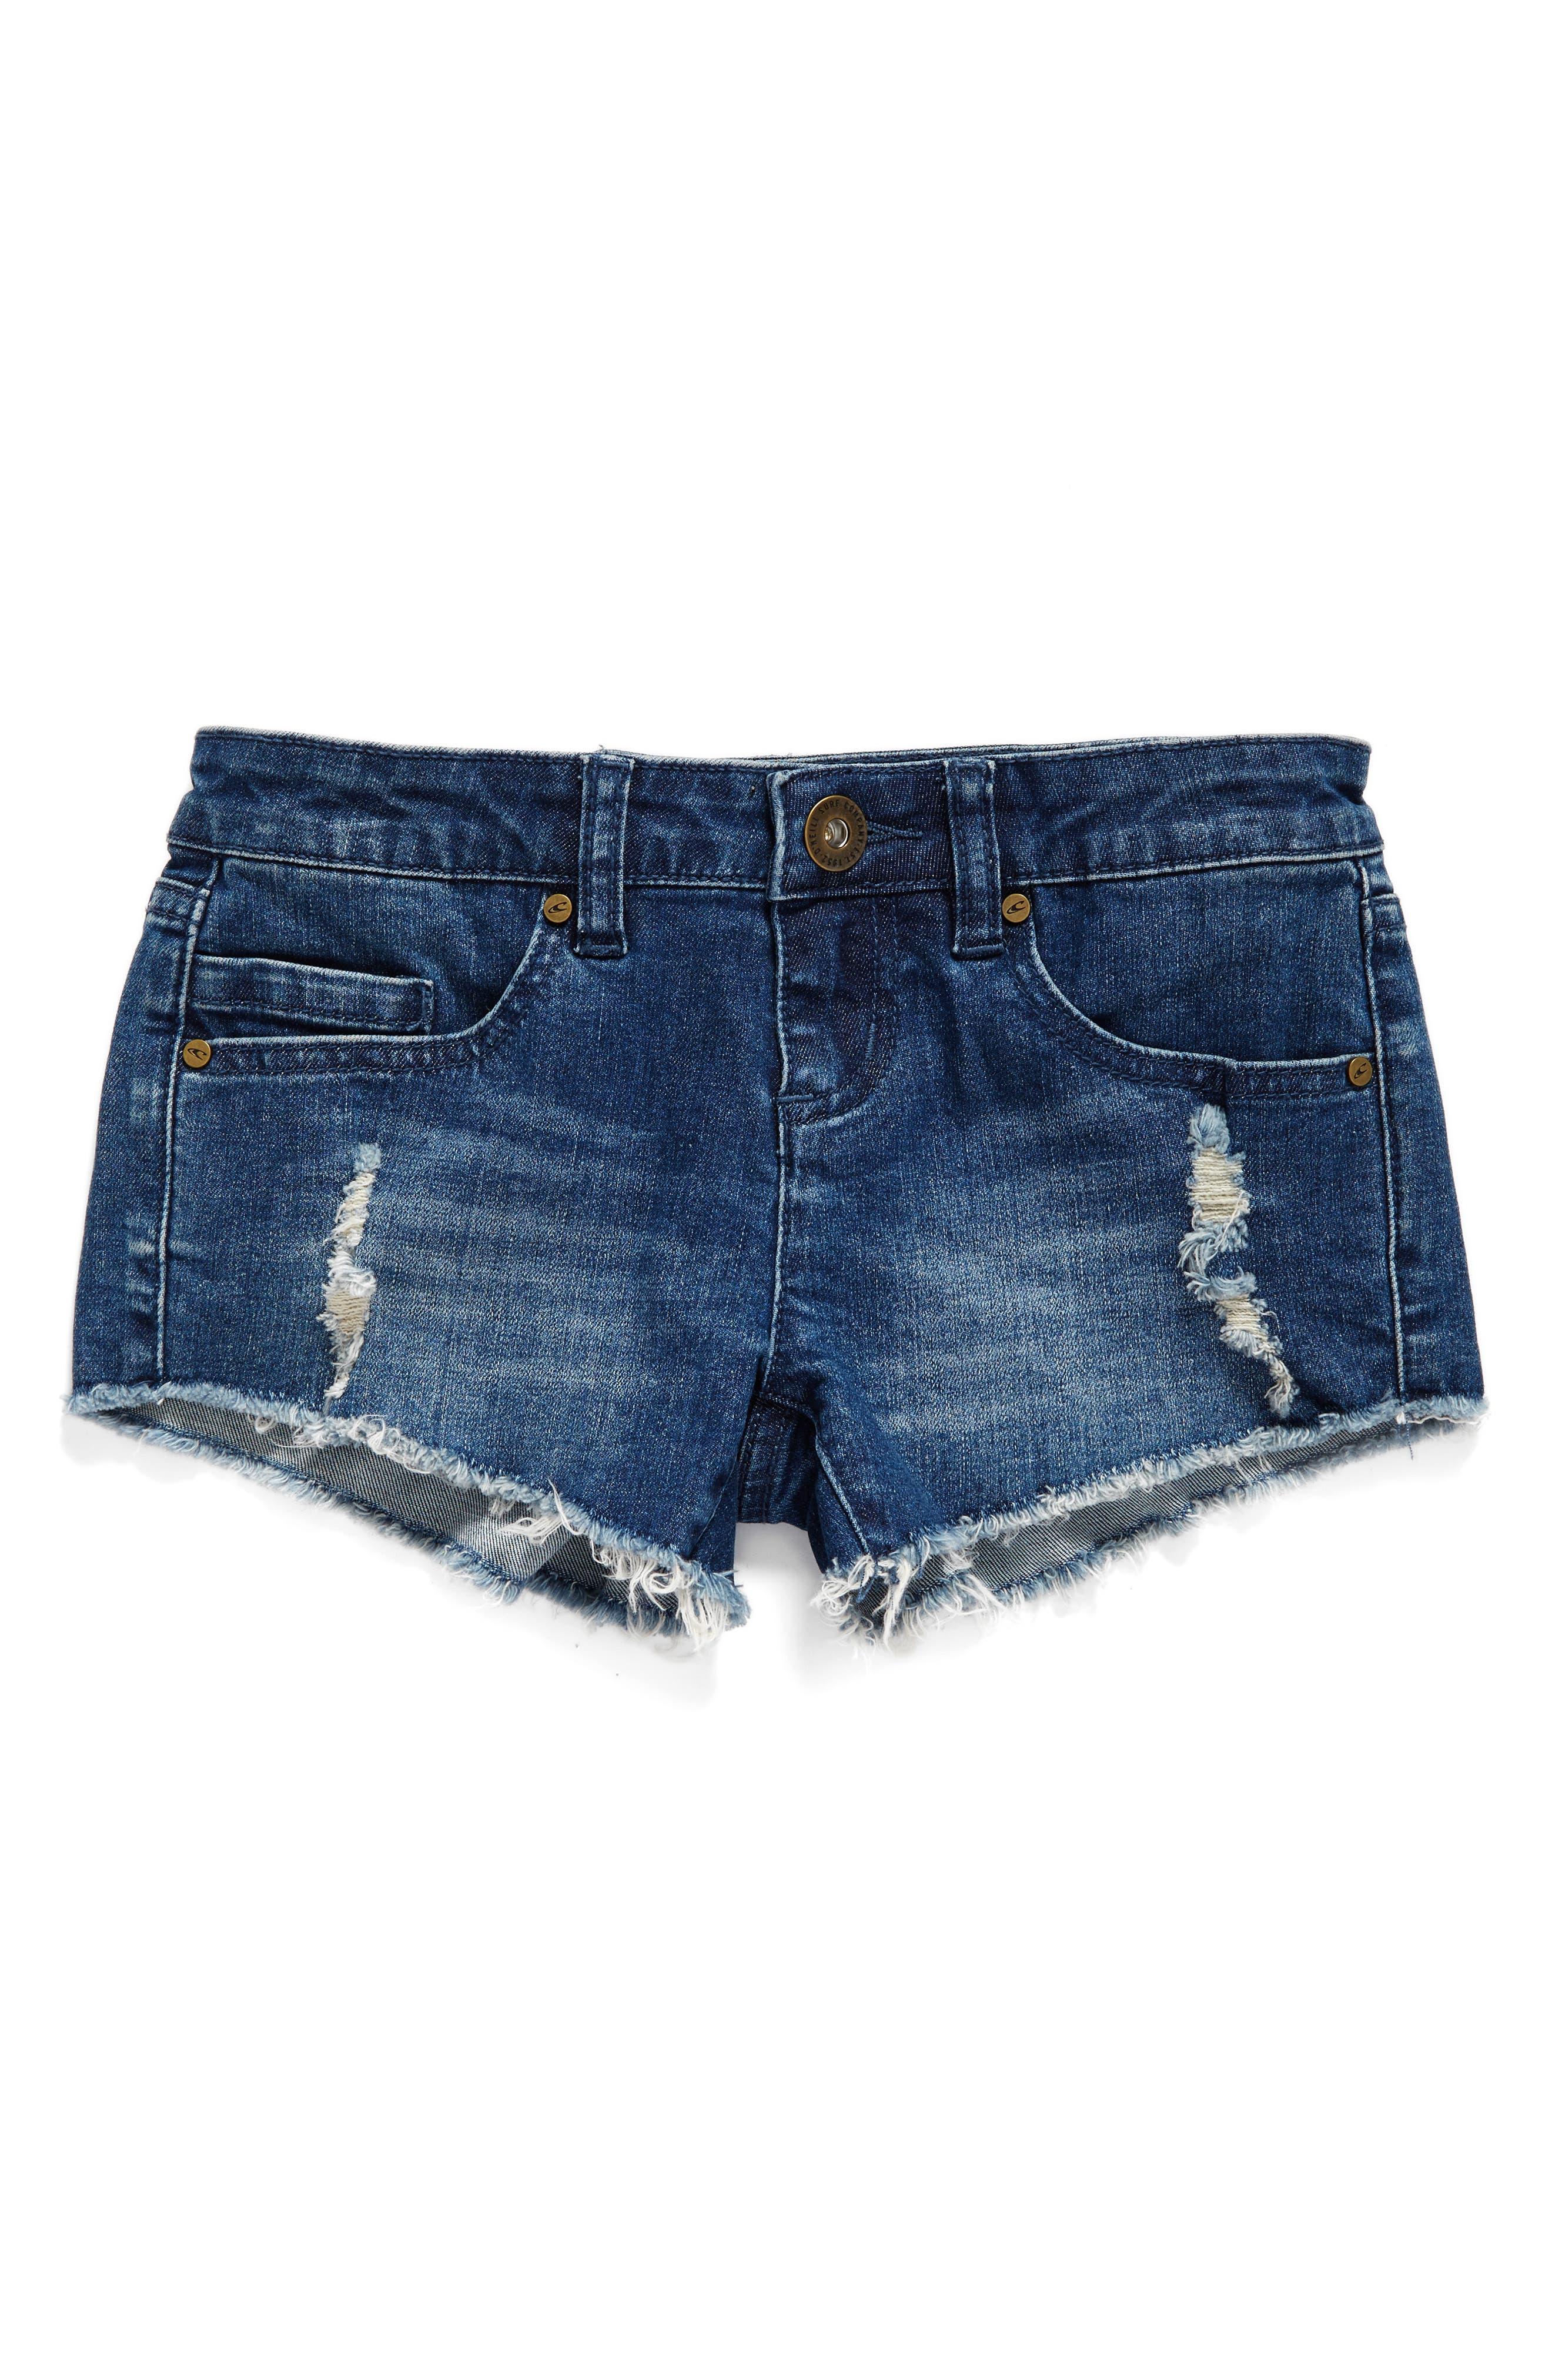 Camper Denim Shorts,                         Main,                         color, Blue Grass